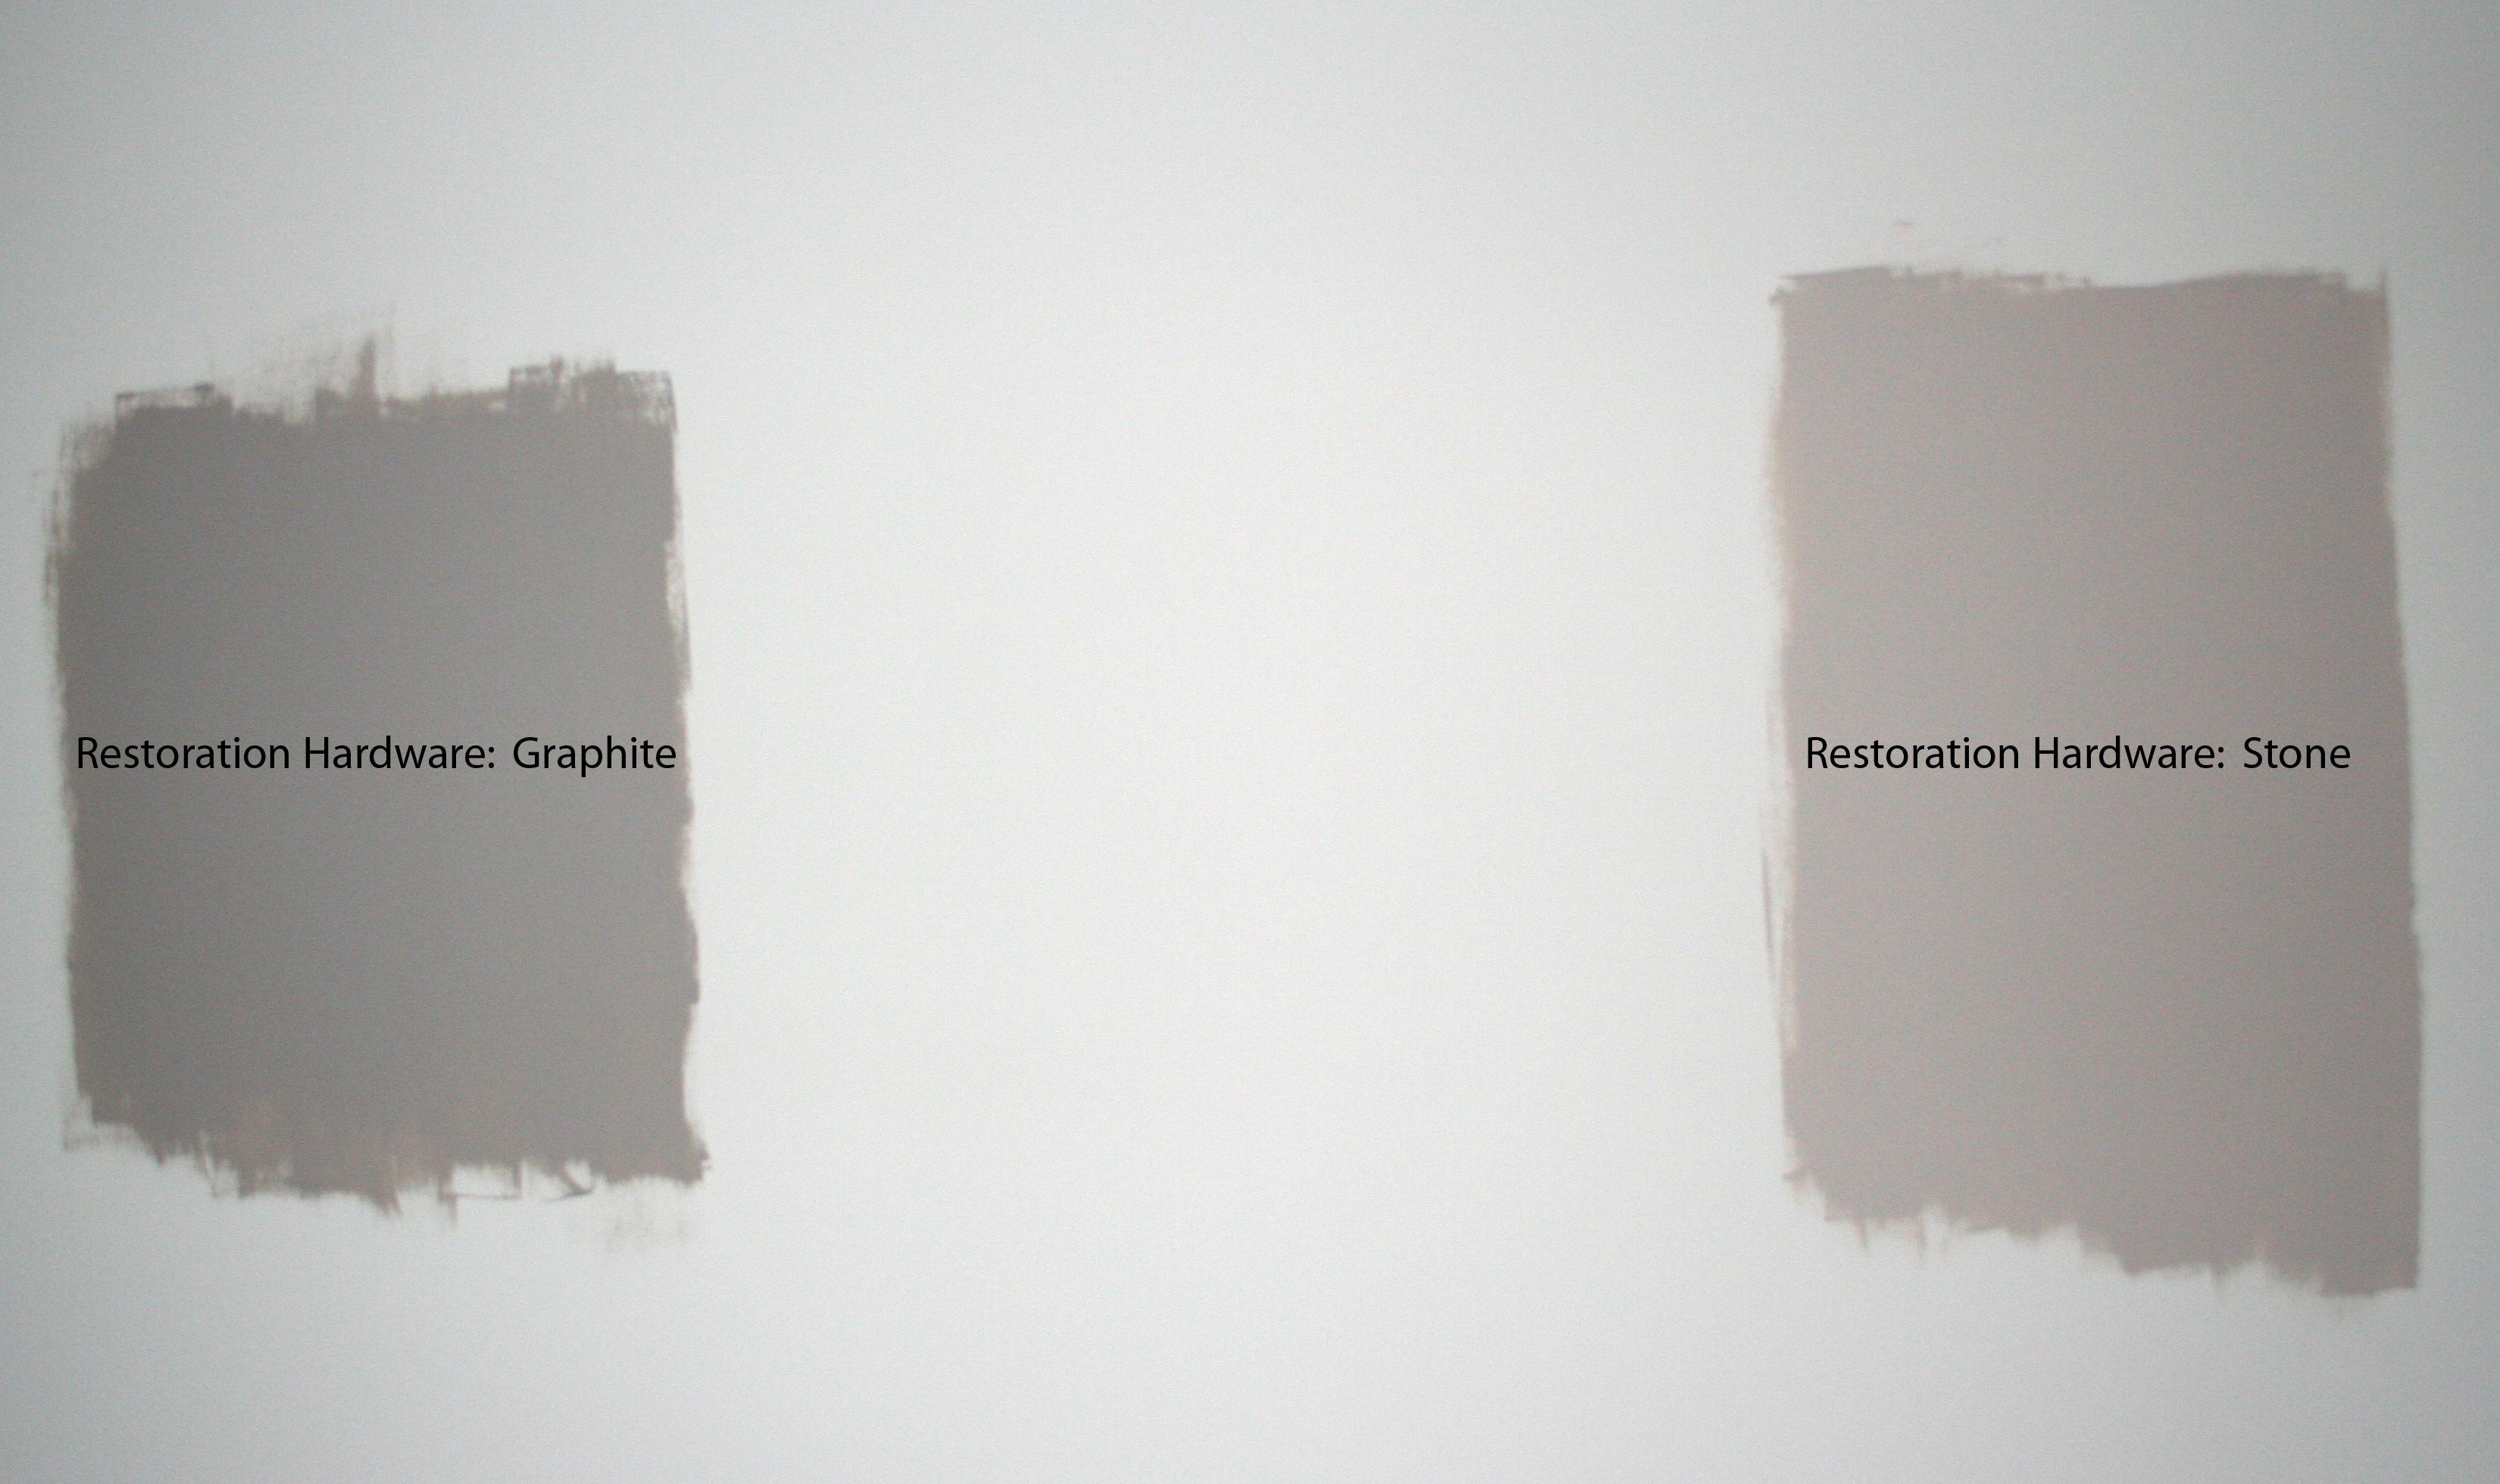 Restoration Hardware Slate Paint Match Stone Vs Graphite Sister Share Pinterest The Two